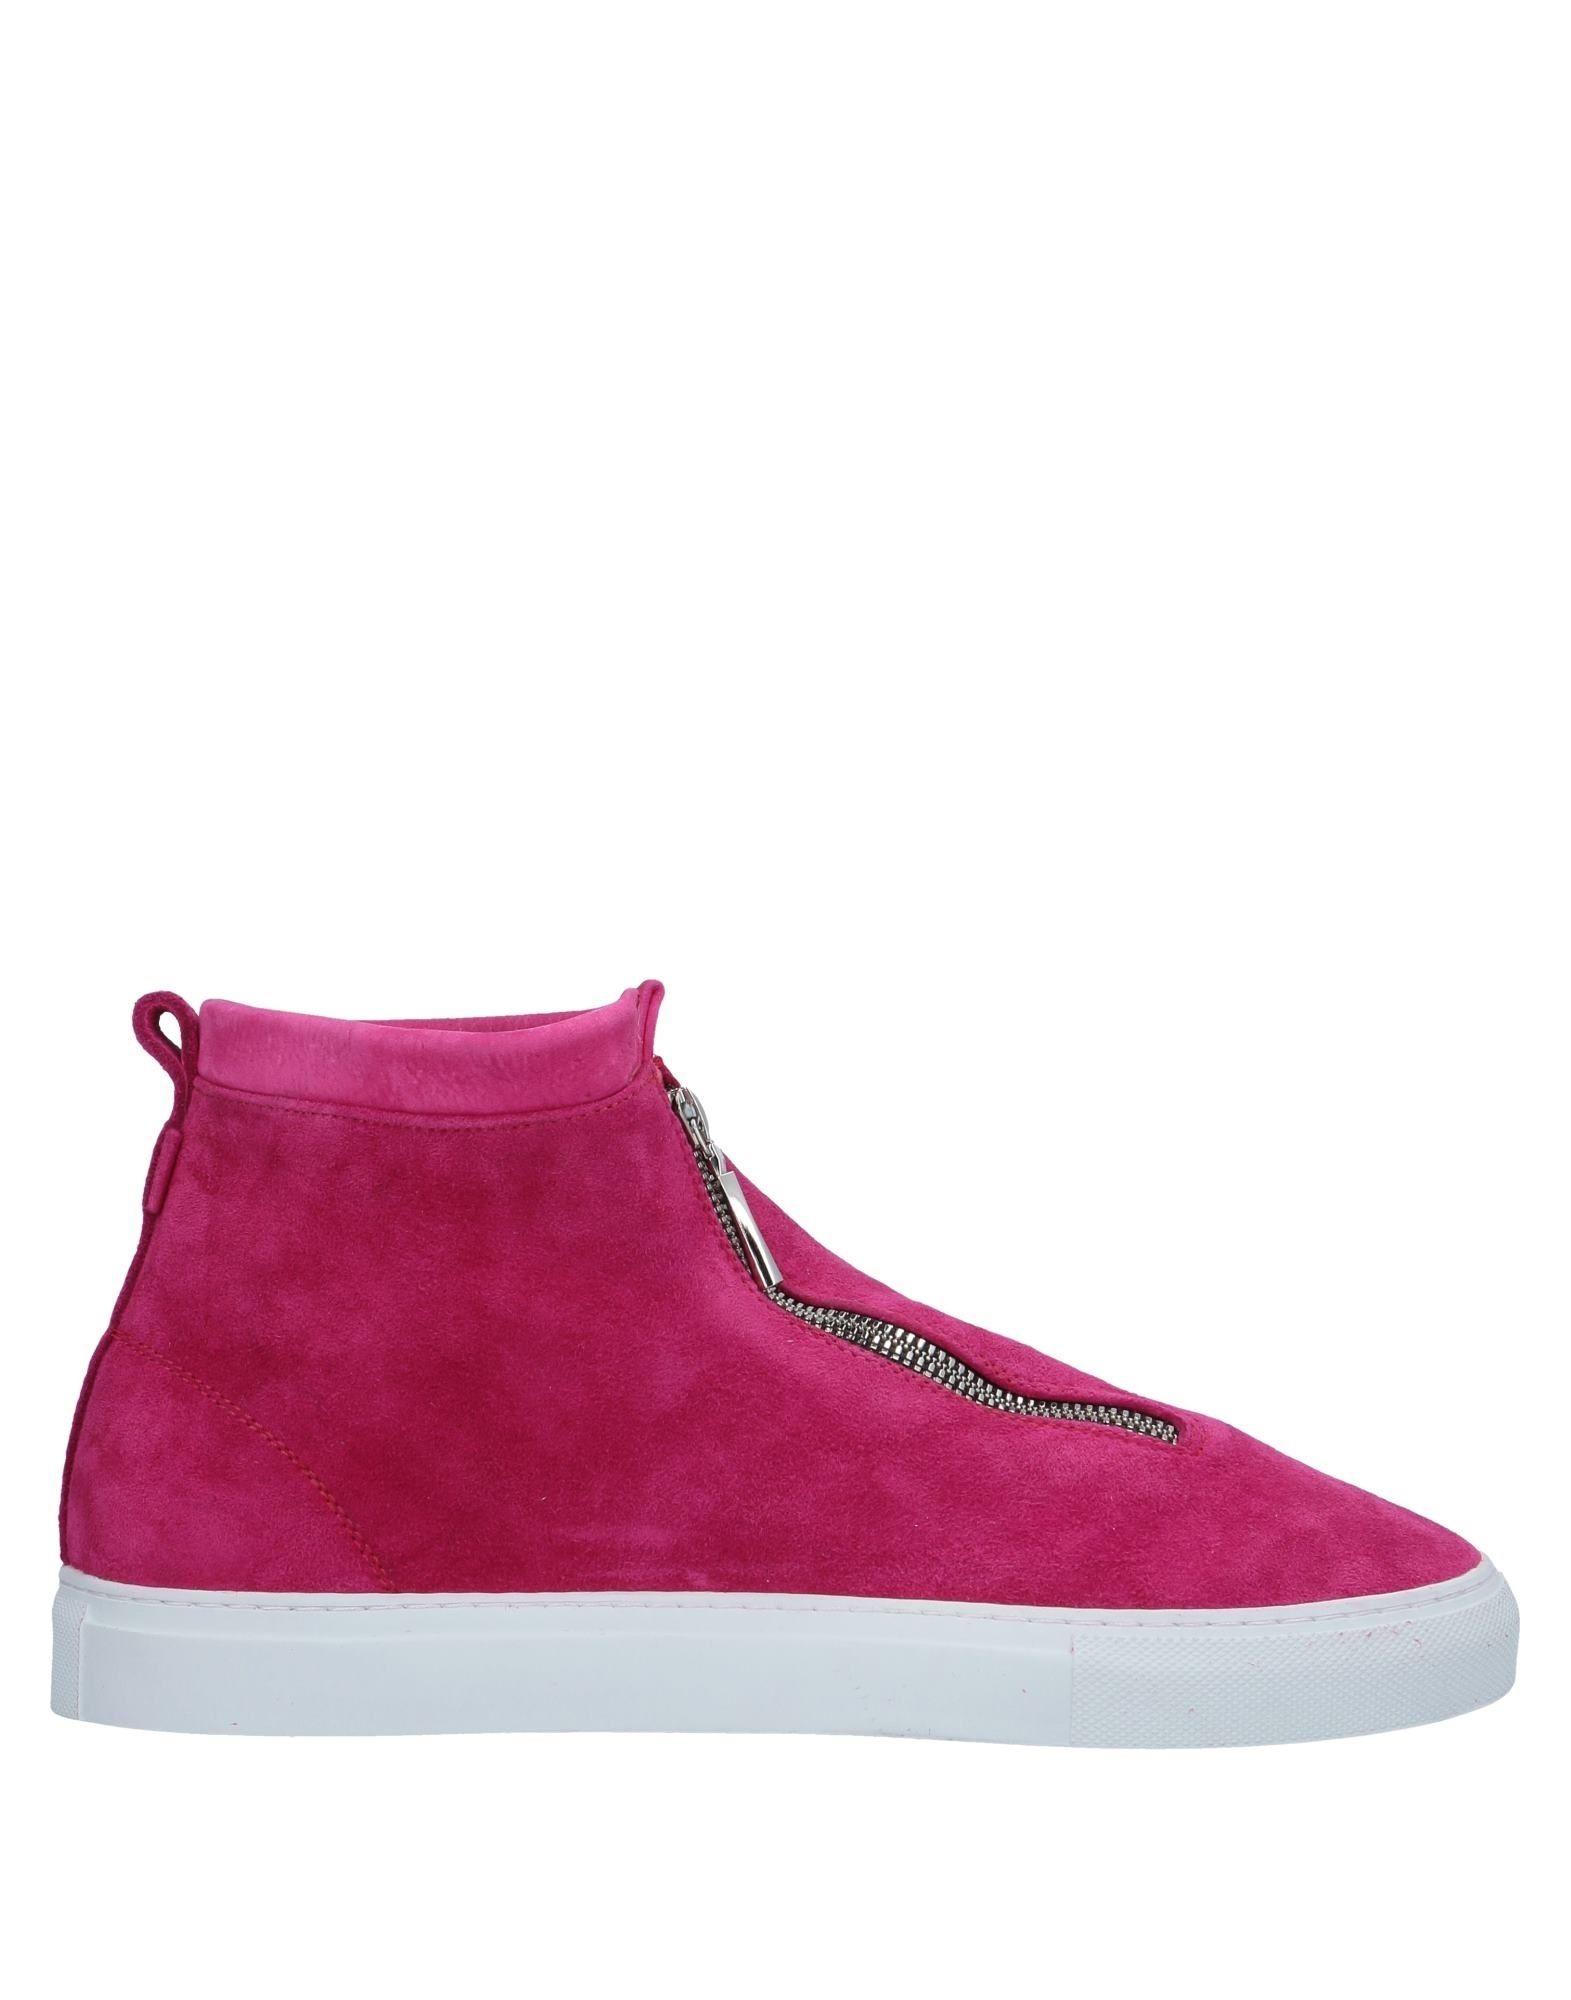 Diemme Sneakers Qualität Herren  11500515KI Gute Qualität Sneakers beliebte Schuhe ccdfc9